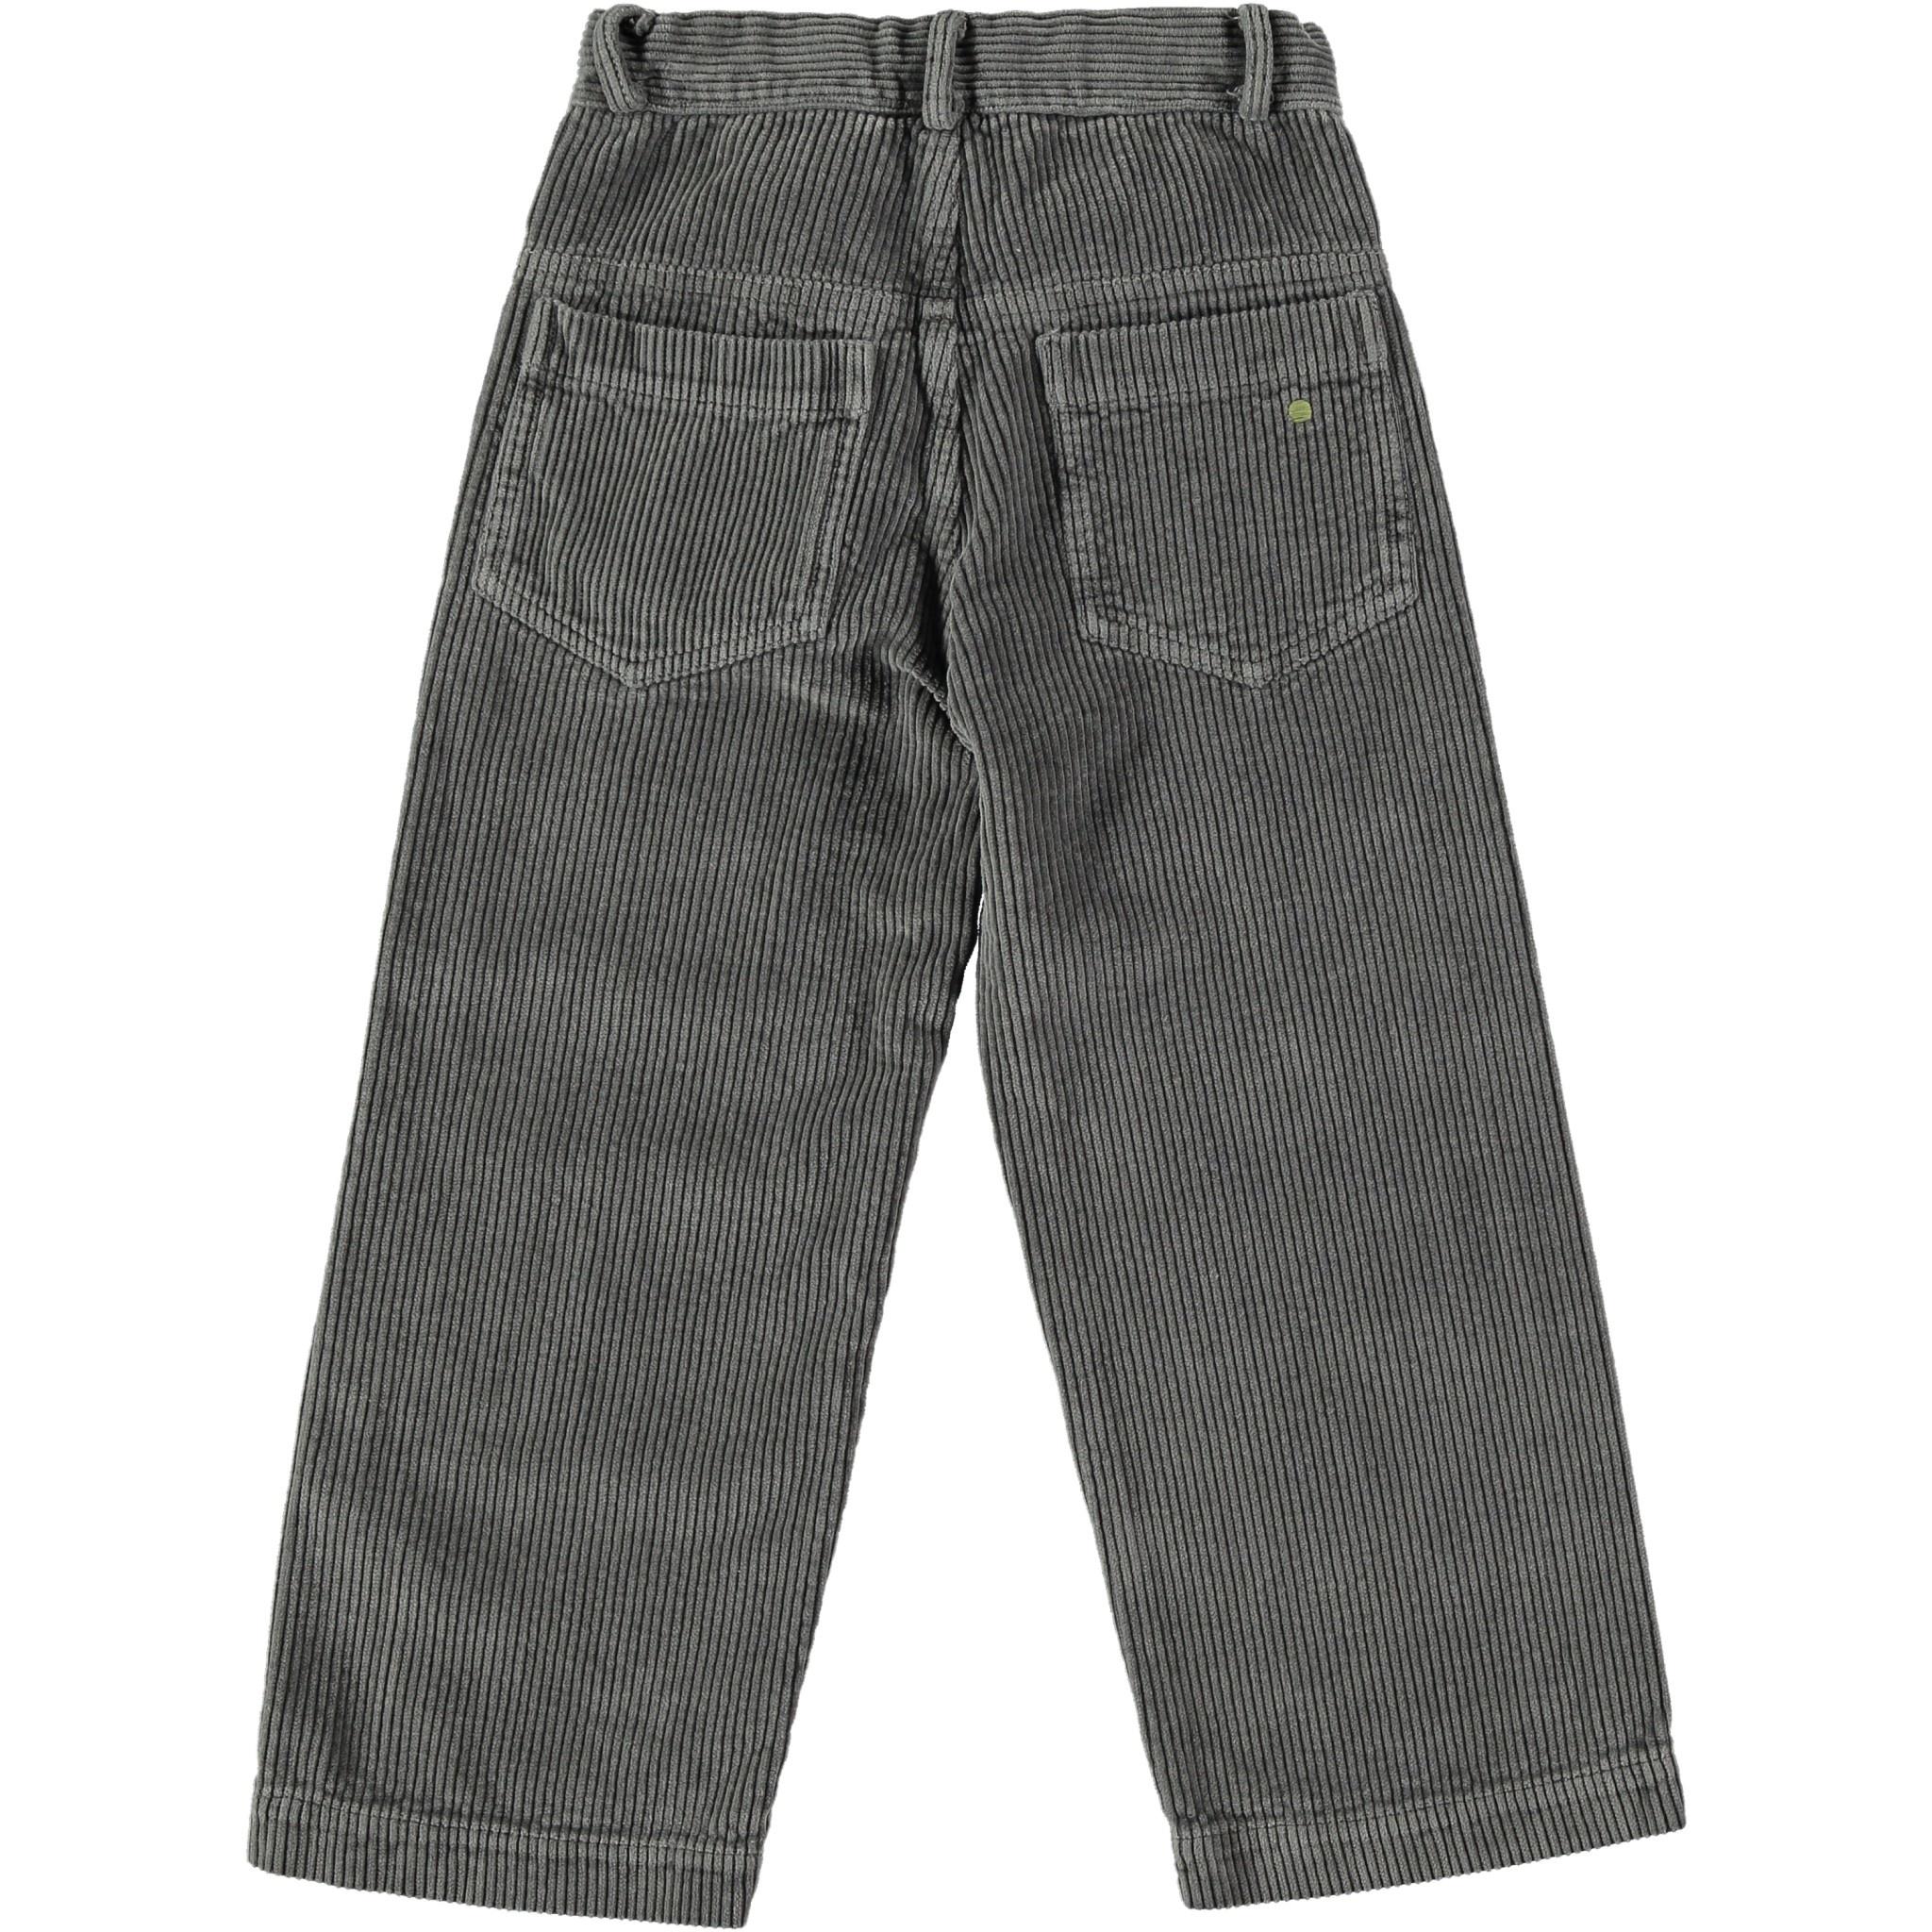 Corduroy trouser everyday good night baby-2